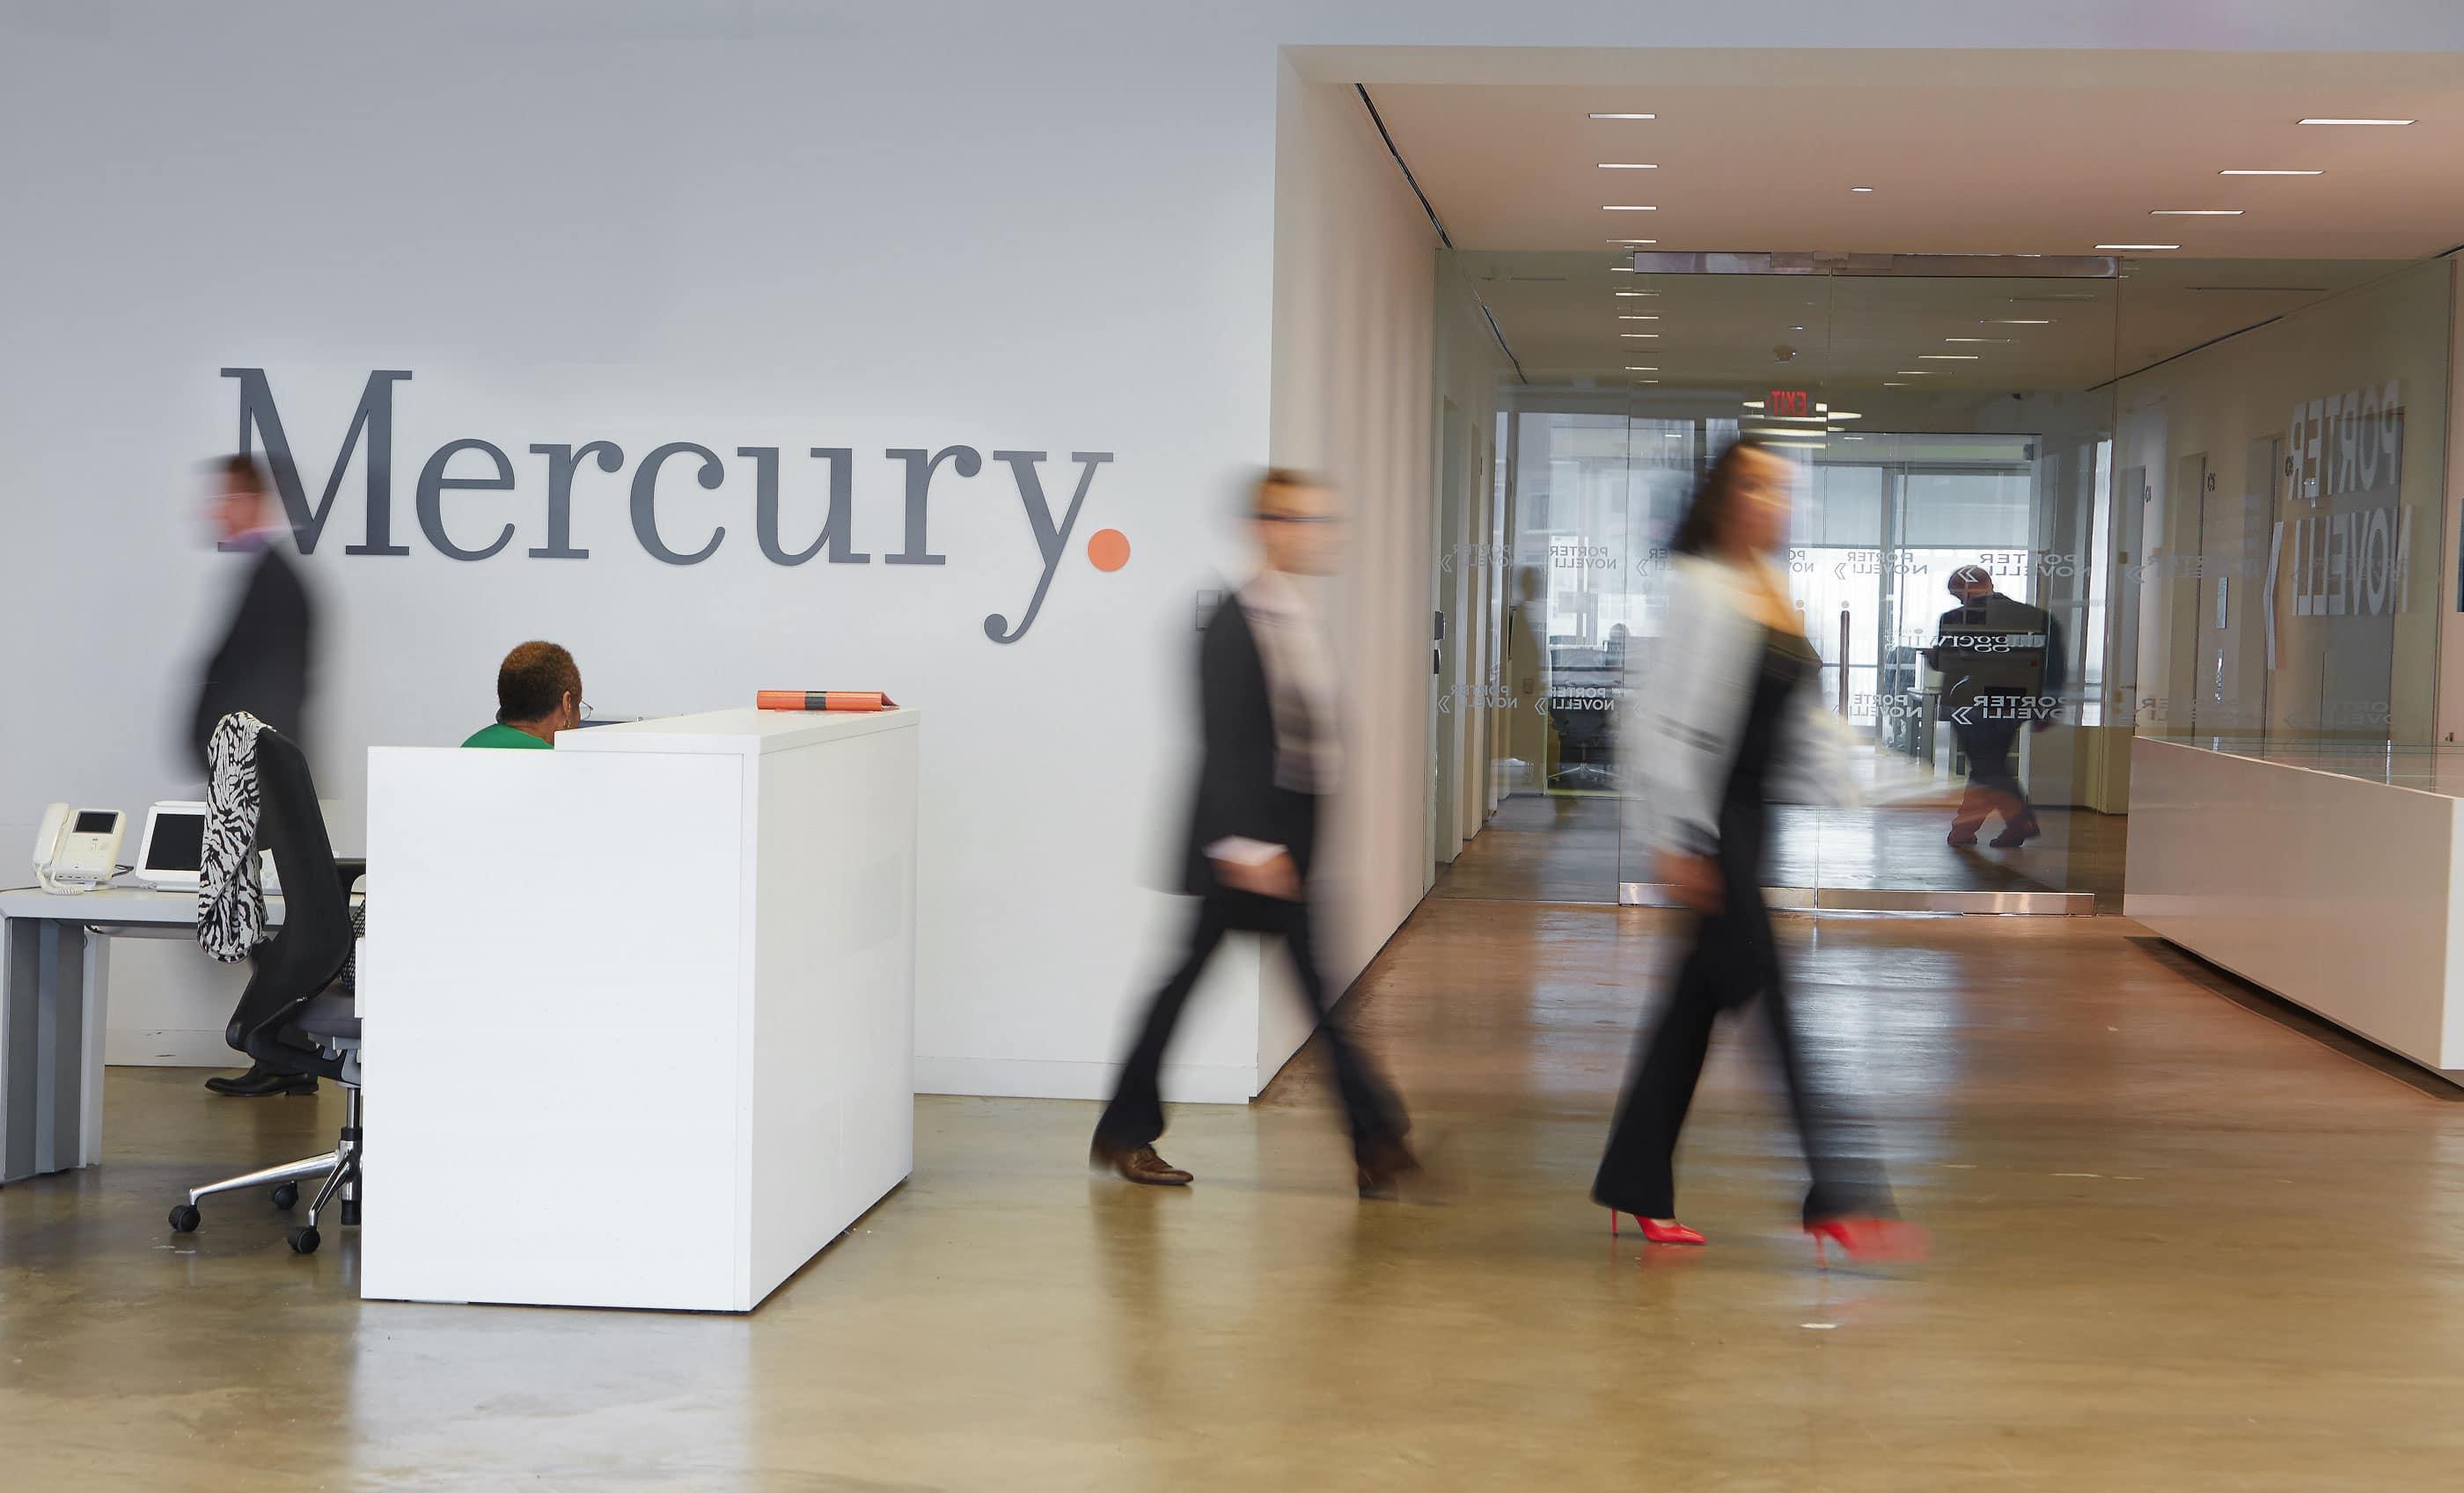 mercury-office-sign-reception-contact4-7190-285.jpg